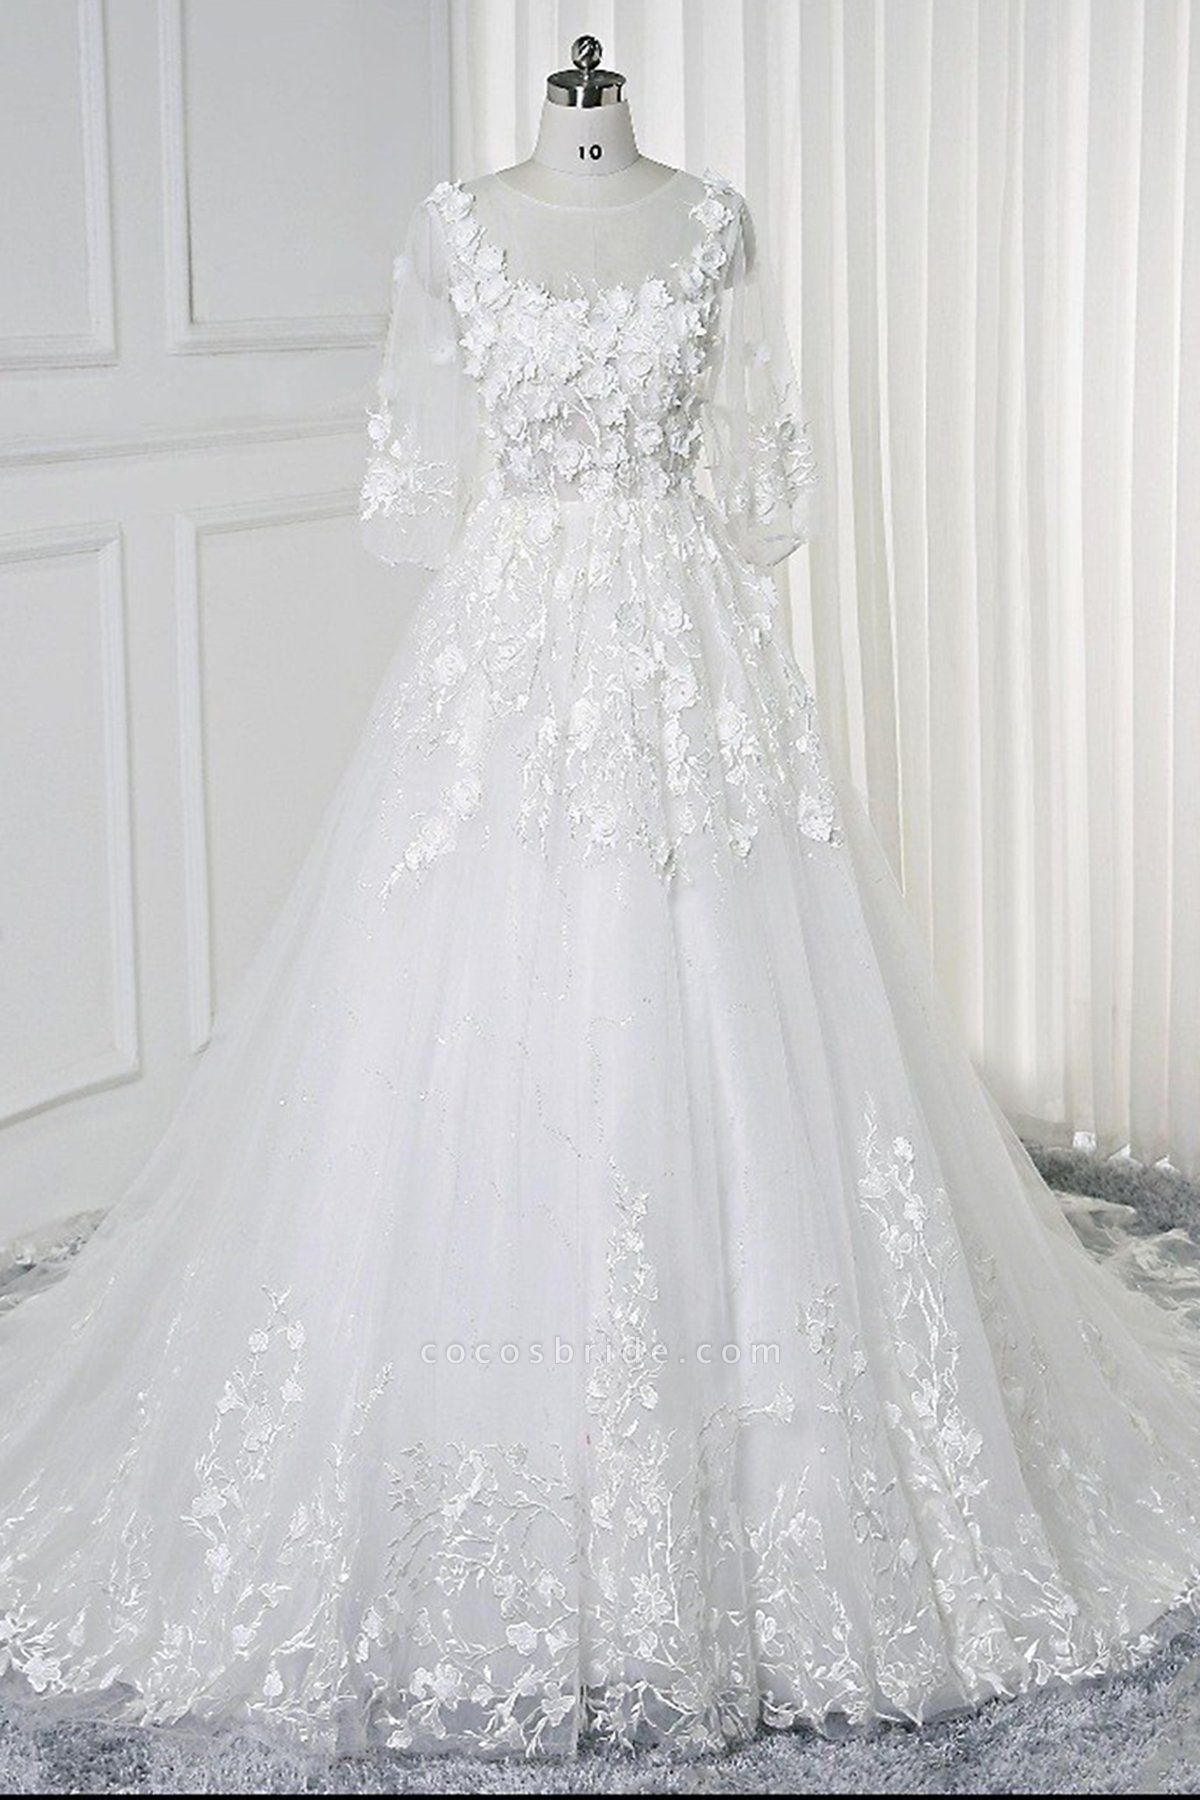 White Lace Flowers Half Sleeves Bridal Wedding Dress